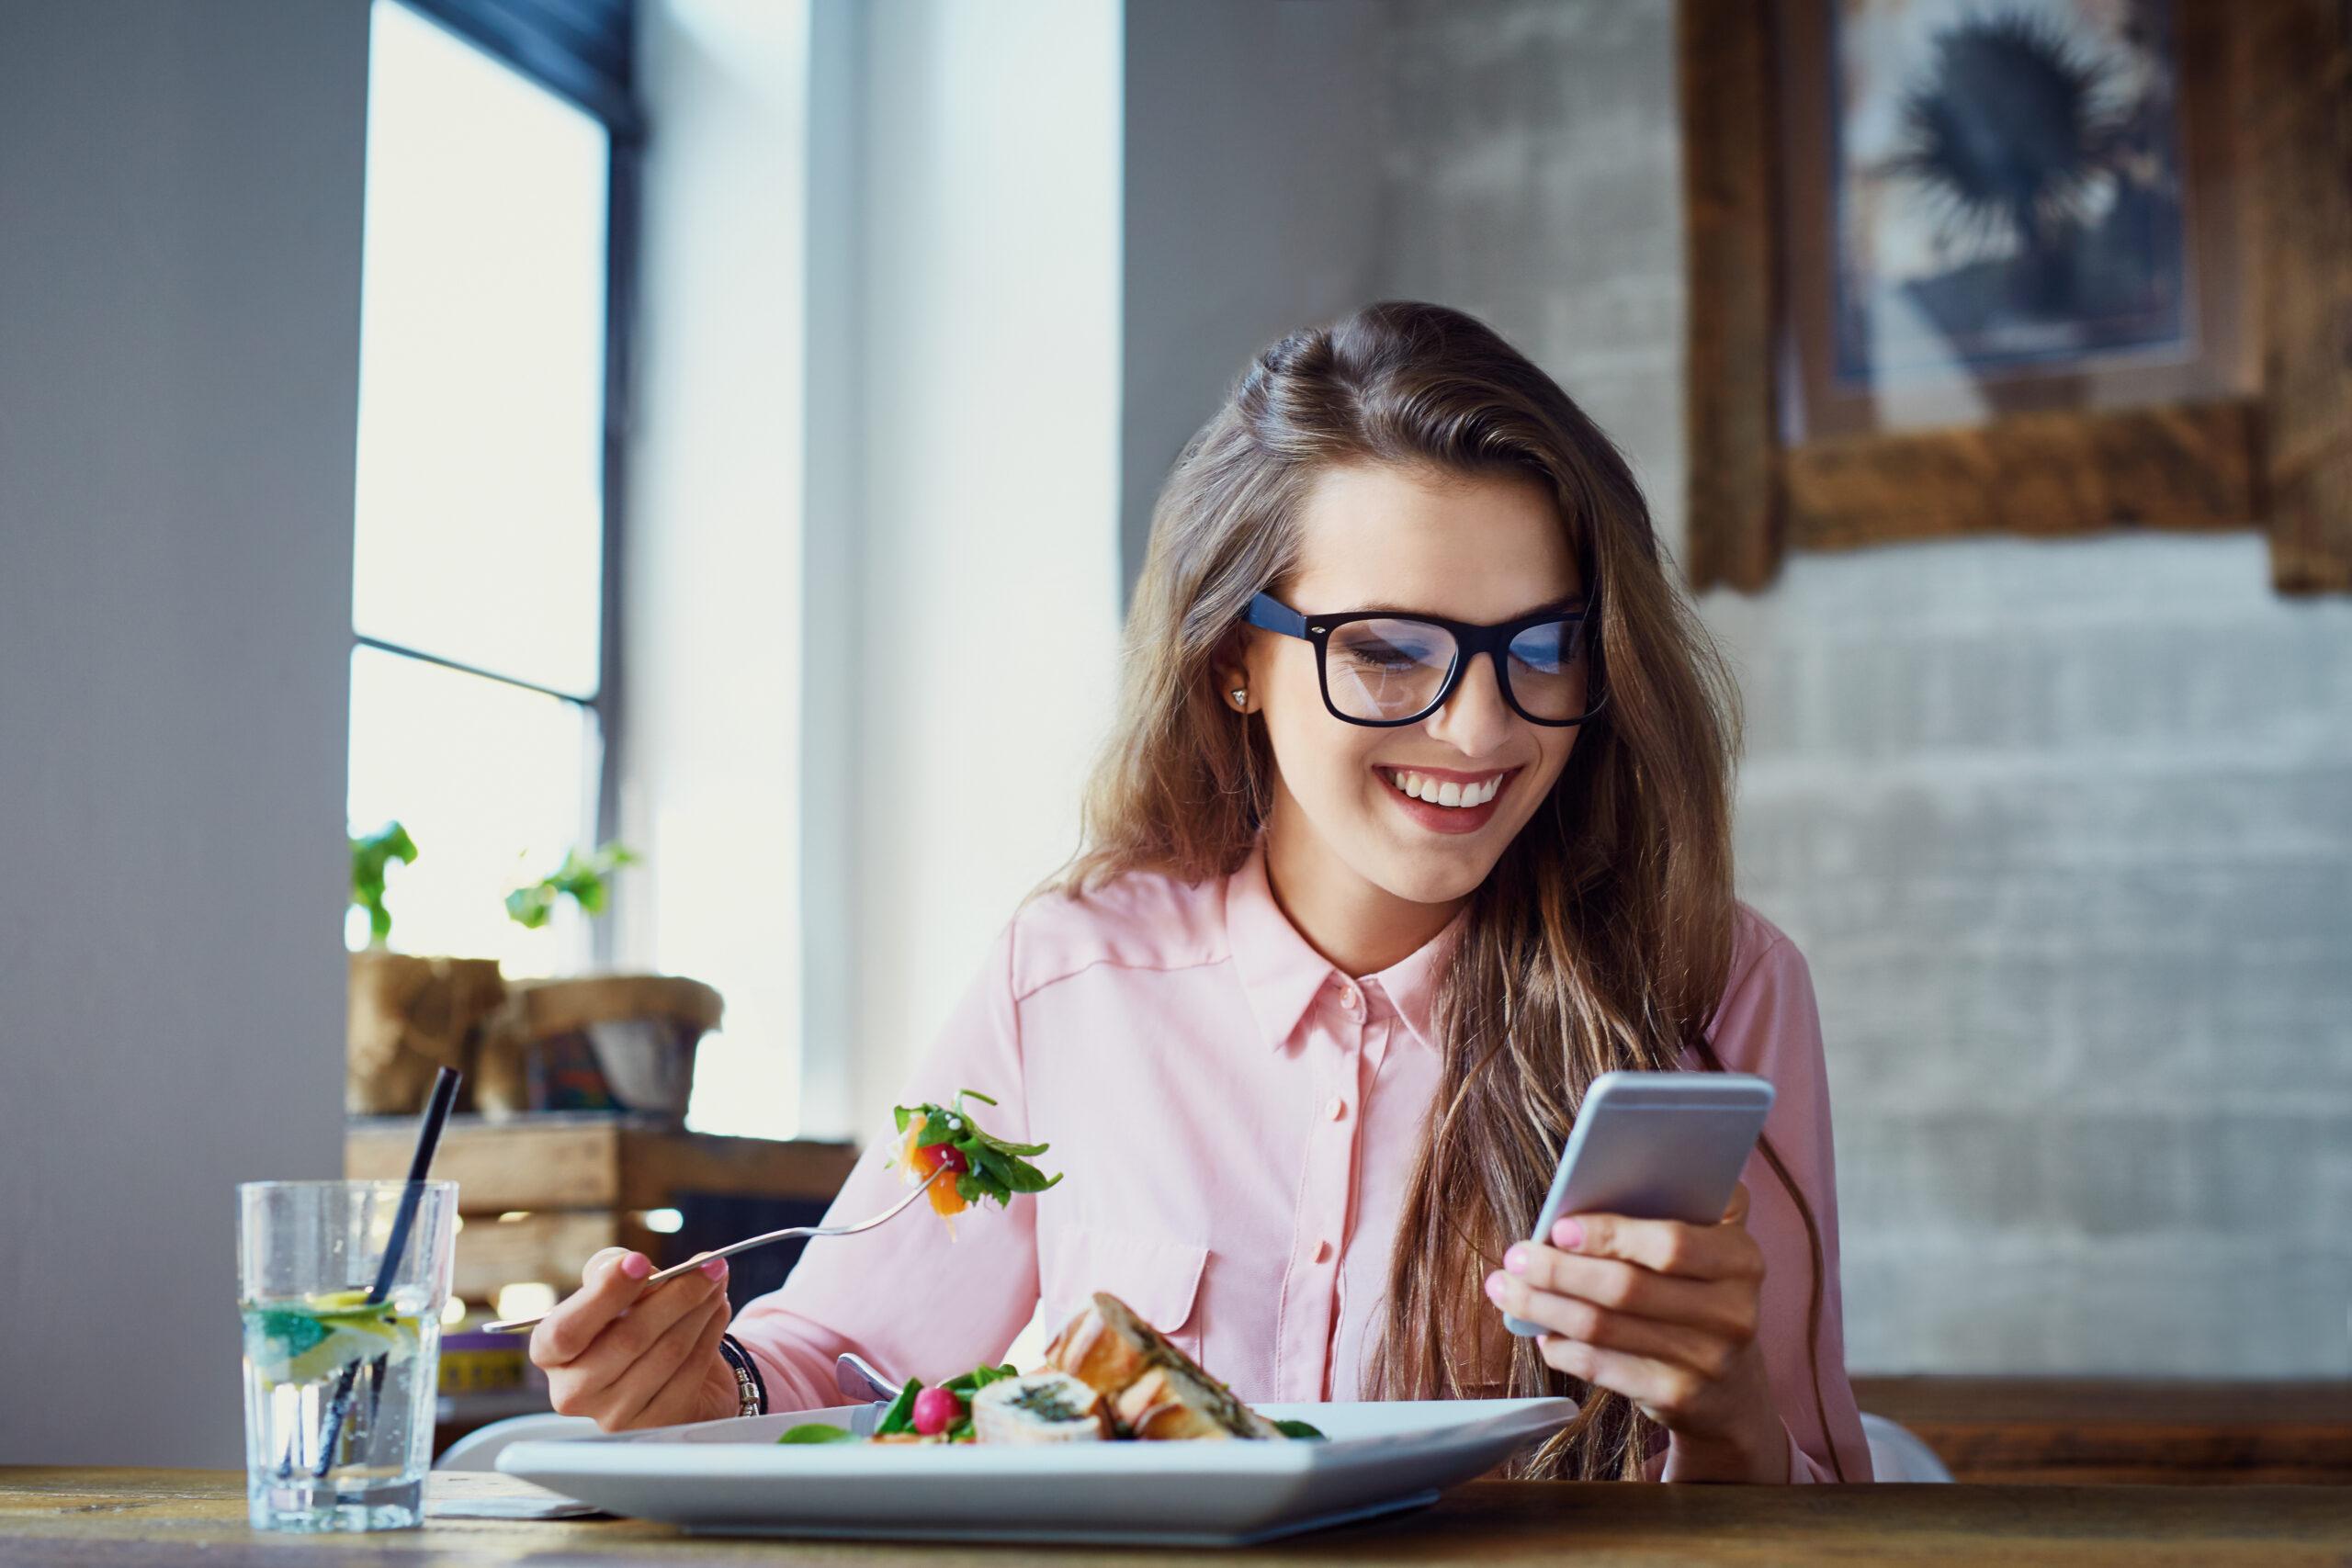 Woman eating healthy and checking her bank balance